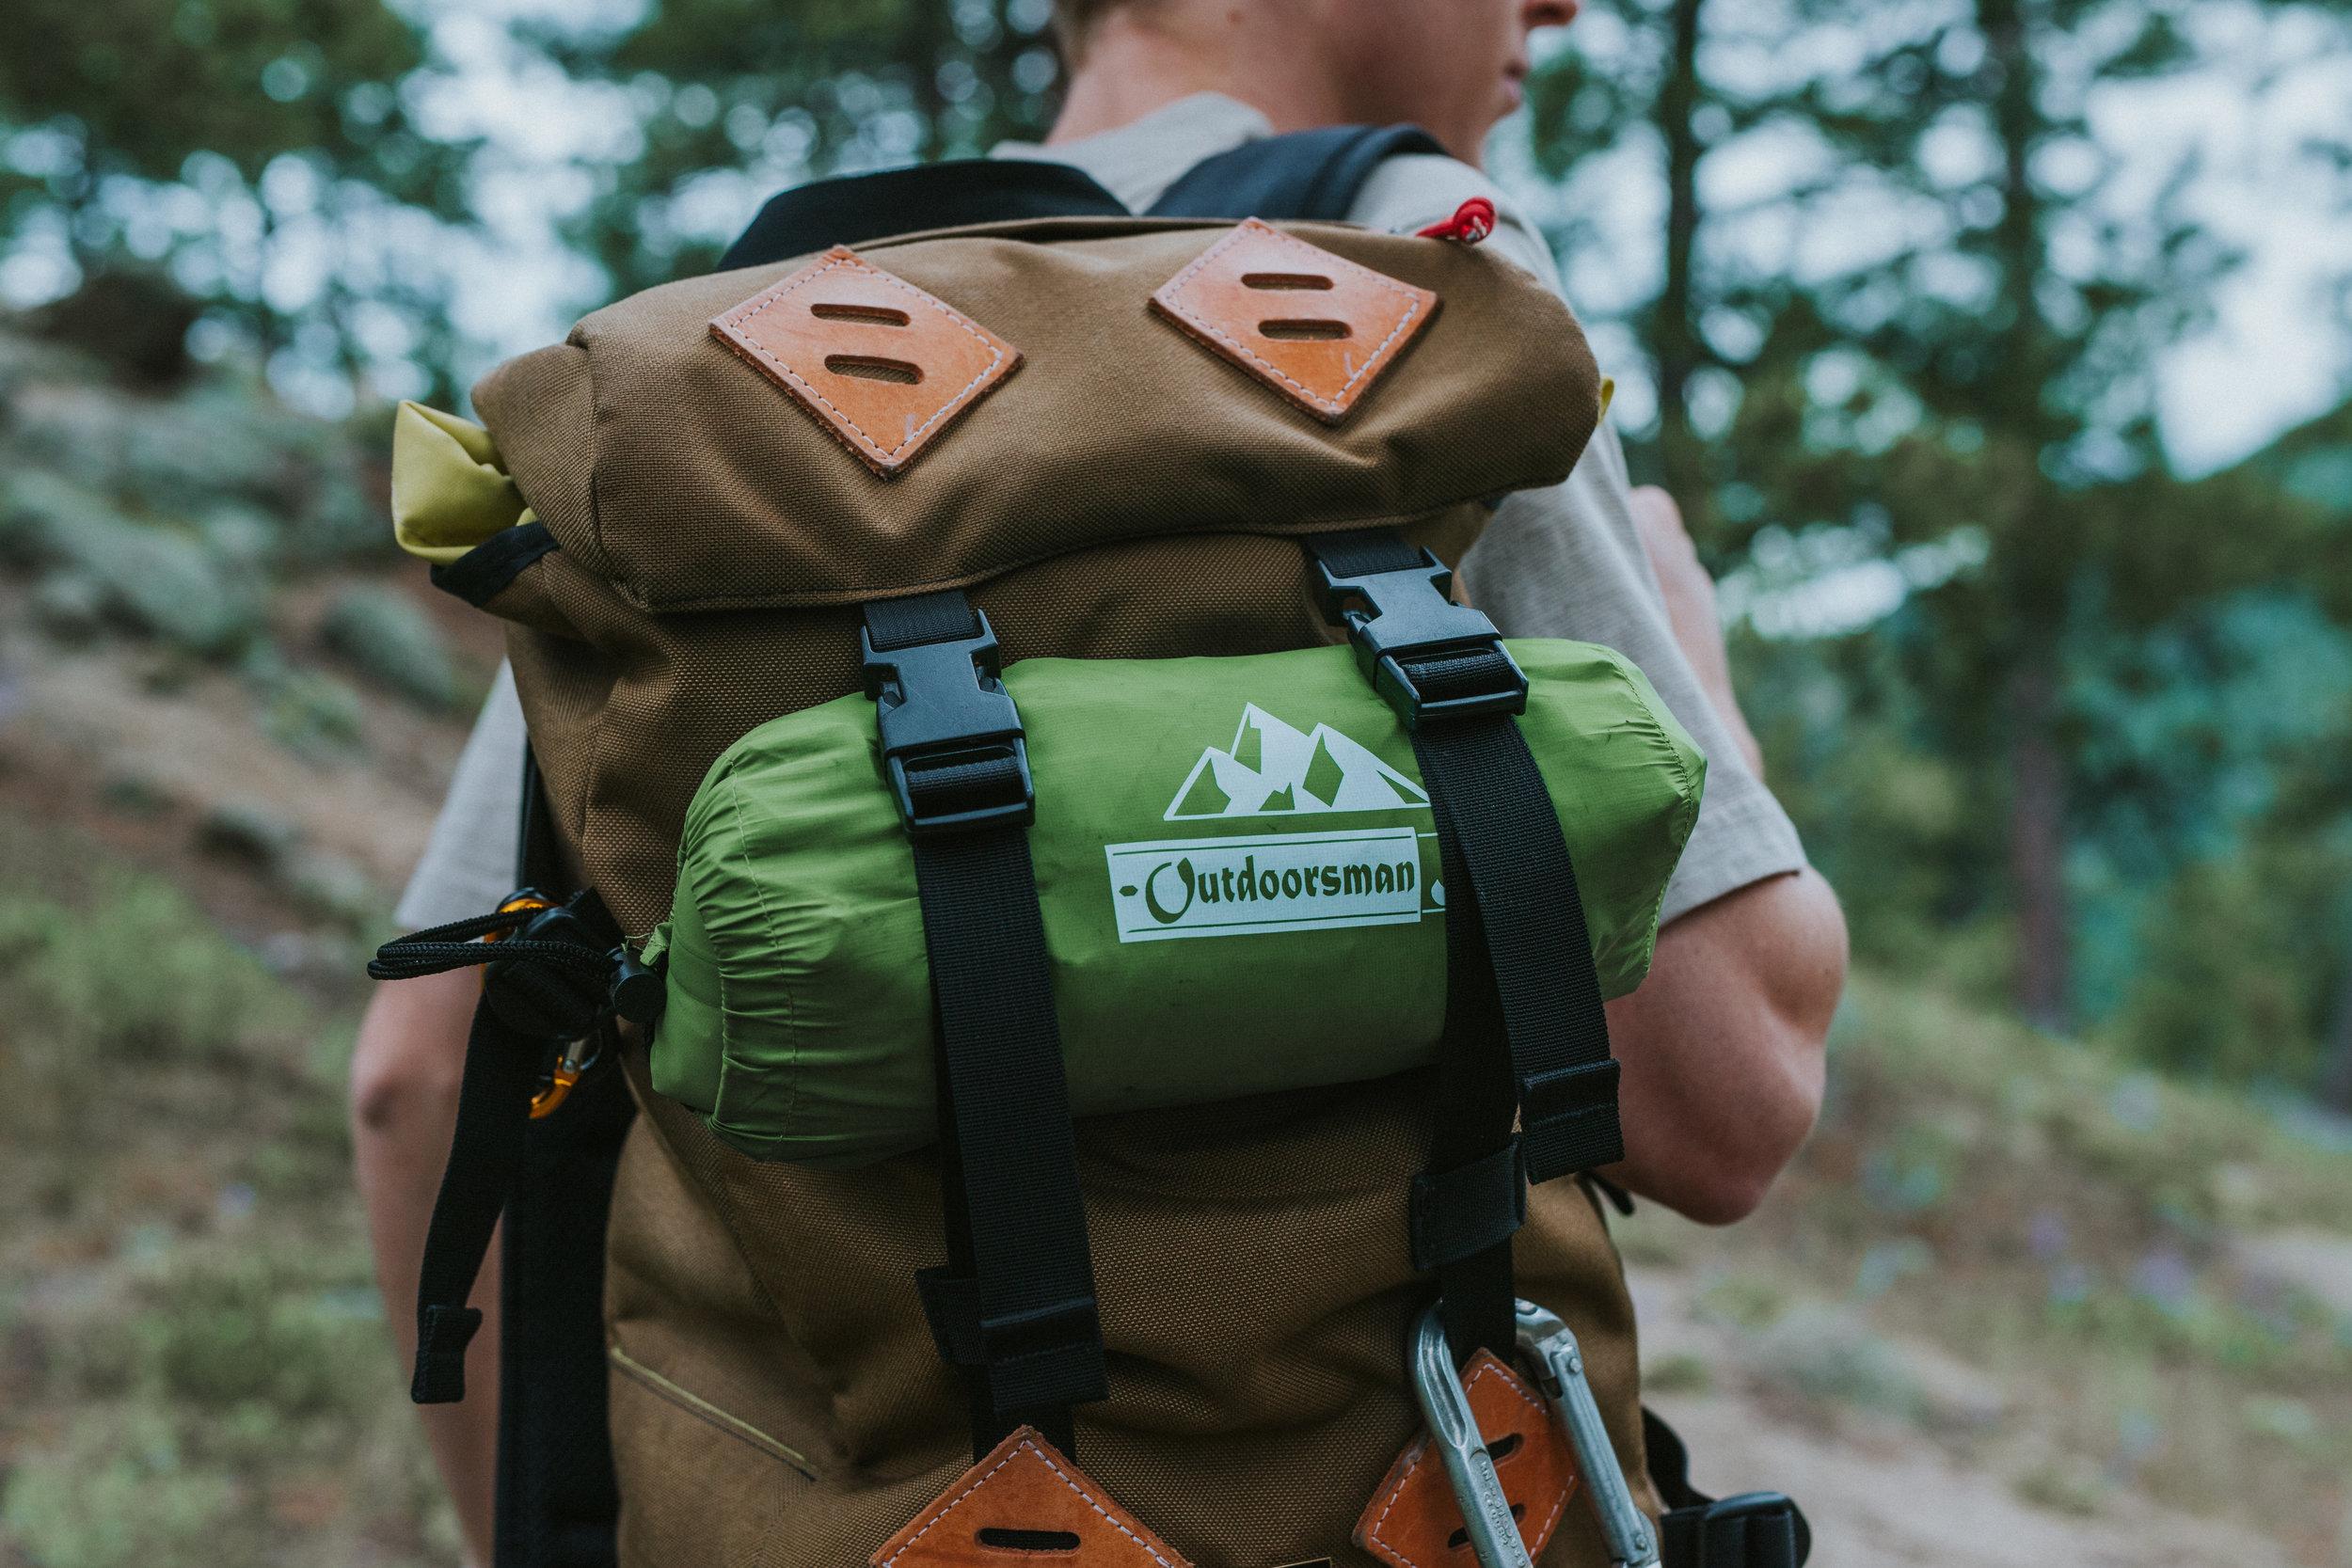 Green Pad carried in backpack-2.jpg